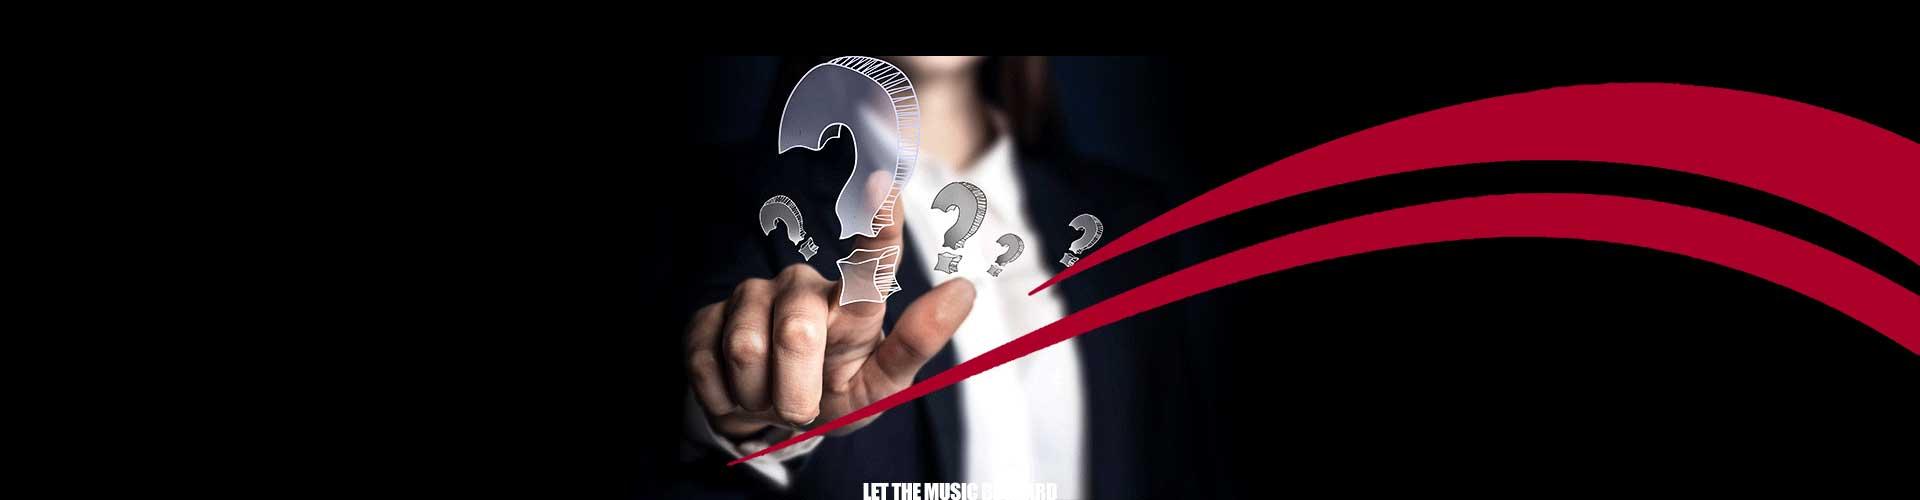 FAQ About Music Lesson in Abu Dhabi